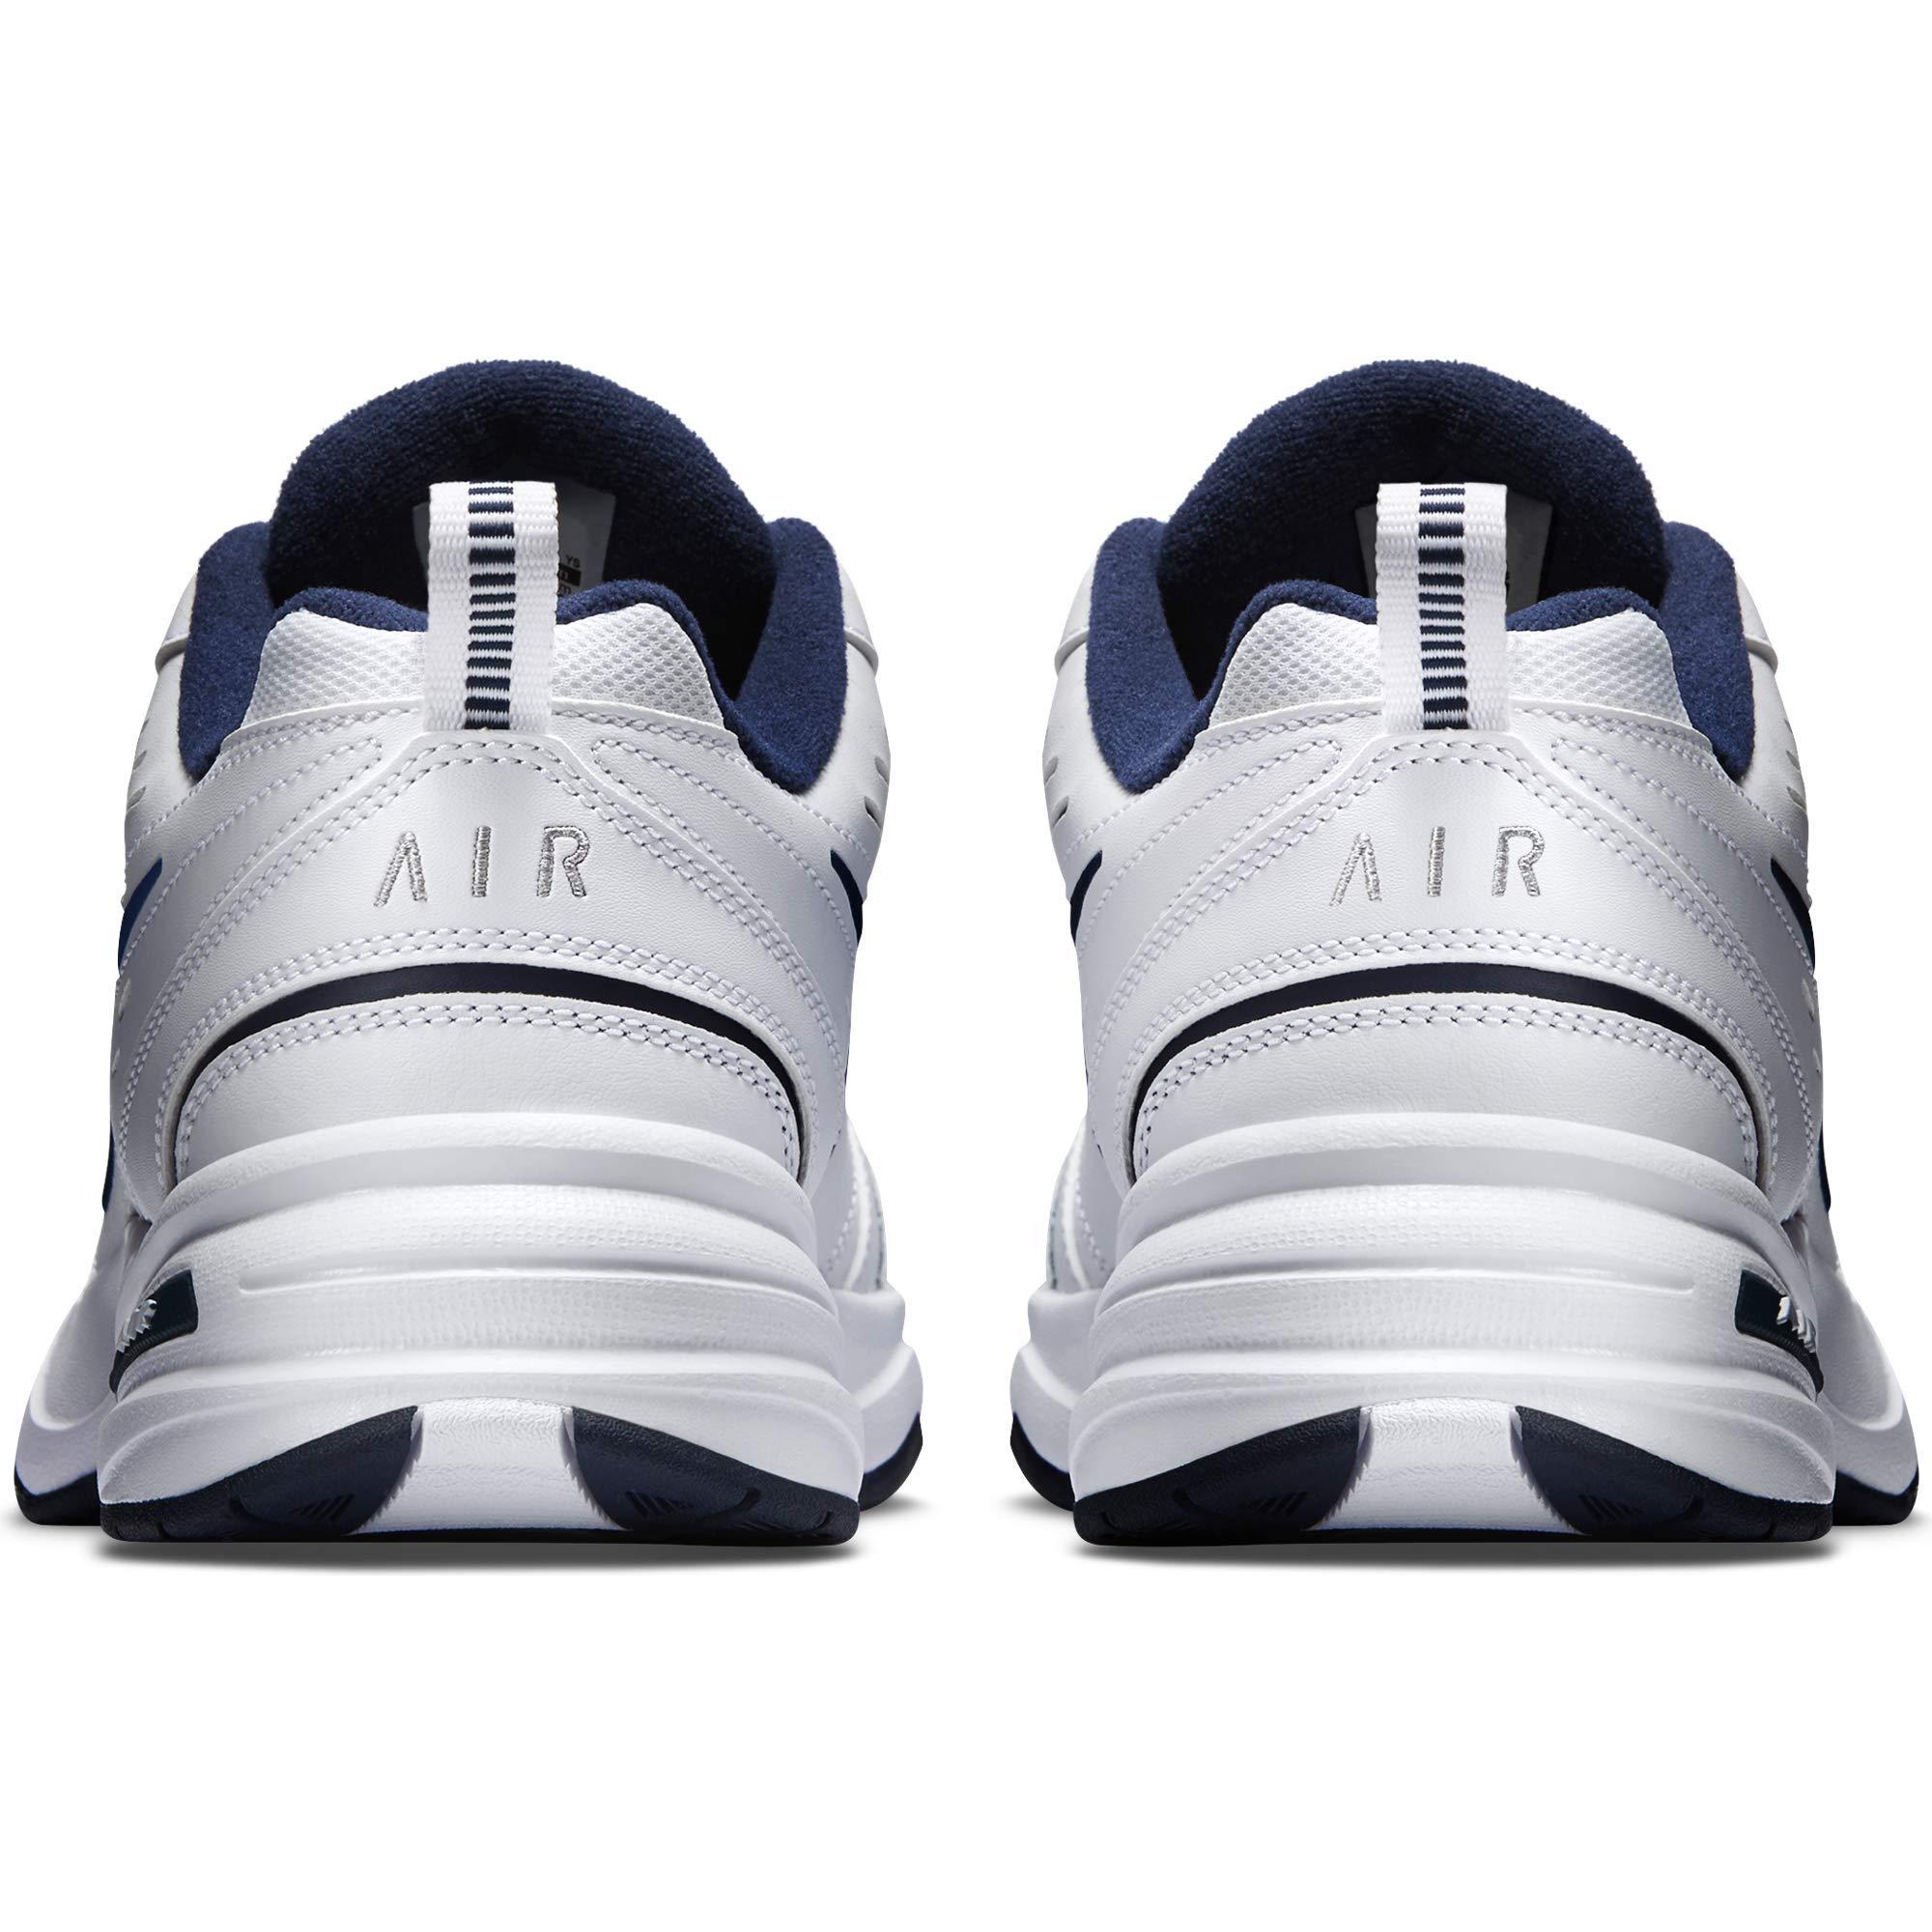 NIKE AIR MONARCH IV (MENS) - 6.5 White/Metallic Silver by Nike (Image #9)